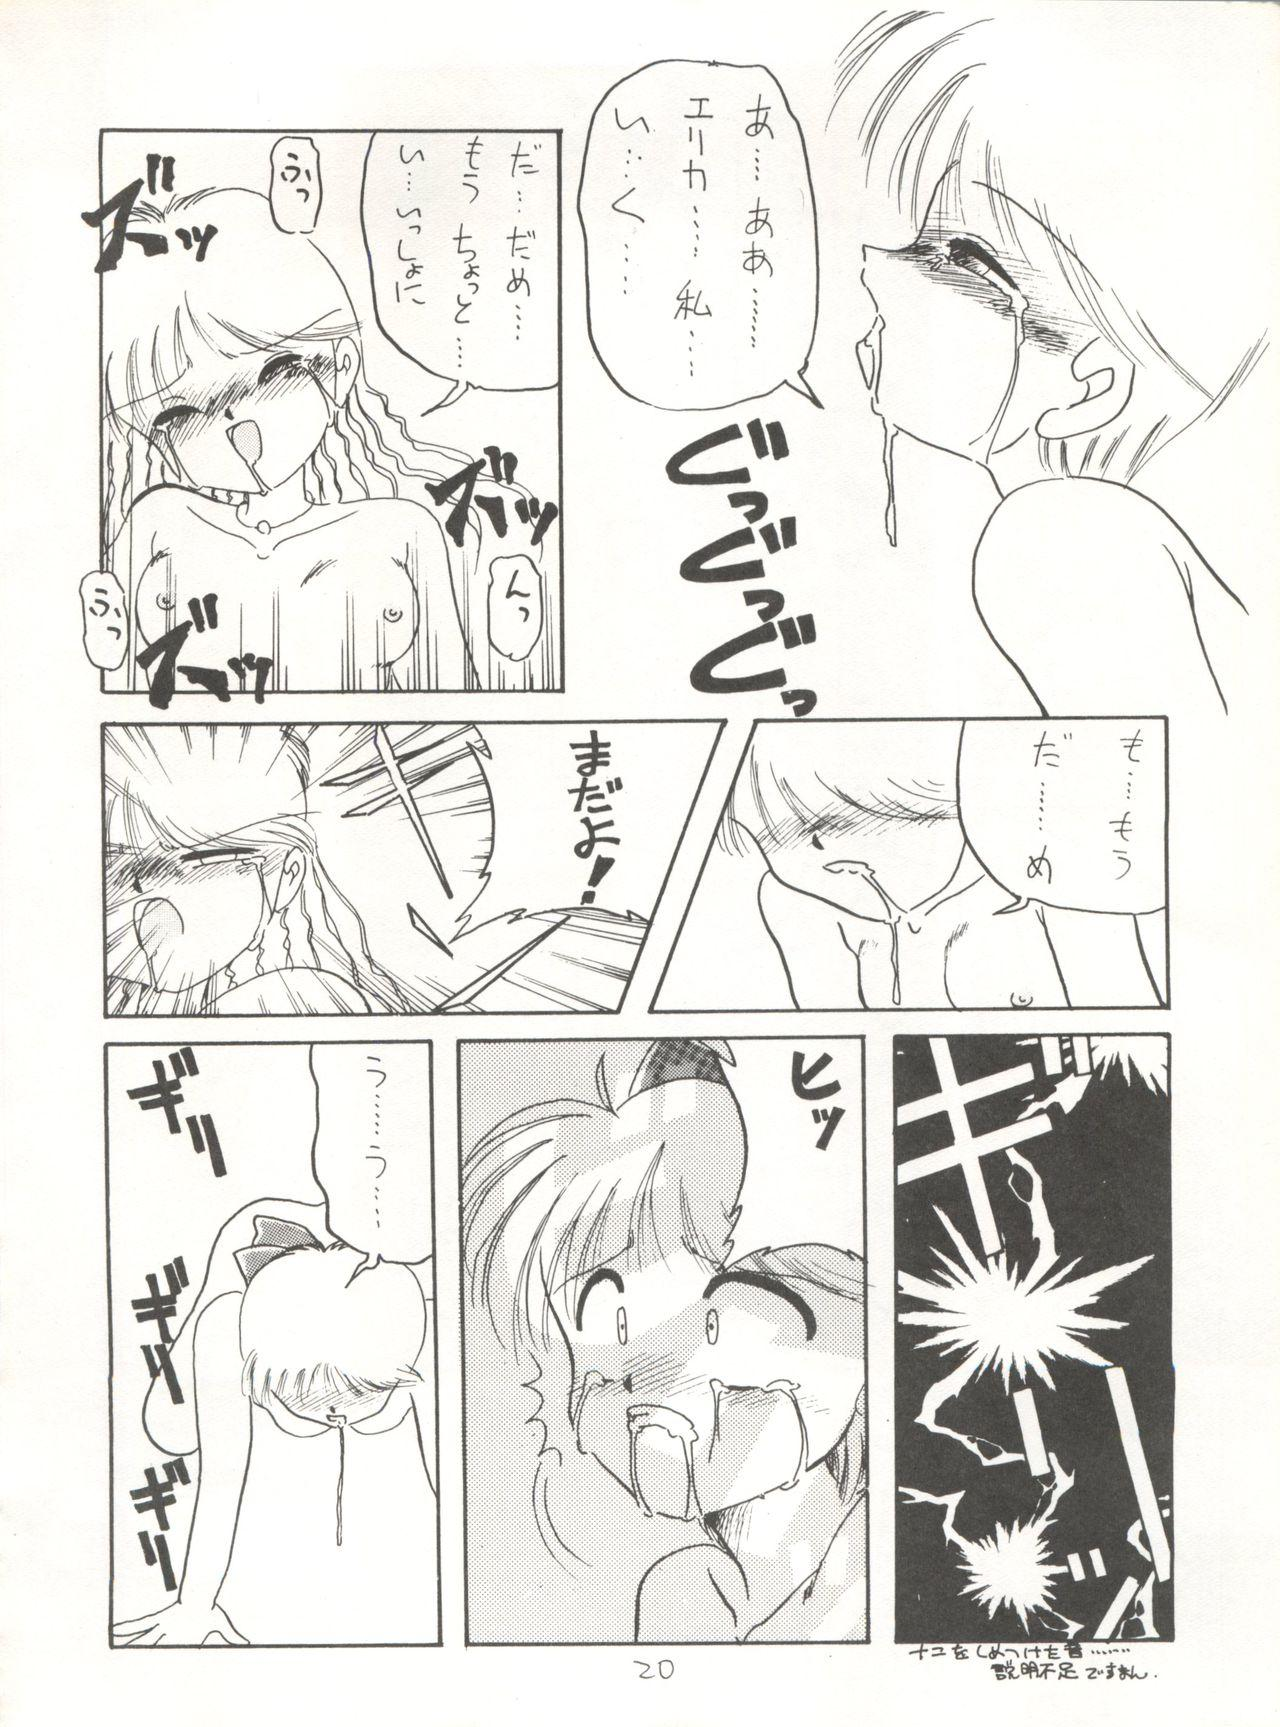 [Global One (MARO)] Sadistic 5 (Cutey Honey, Devilman, Sailor Moon), [Global One (MARO)] Sadistic (Dirty Pair, Fushigi no Umi no Nadia, Sailor Moon), [Studio Ikkatsumajin] .ribbon (Hime-chan's Ribbon) 143